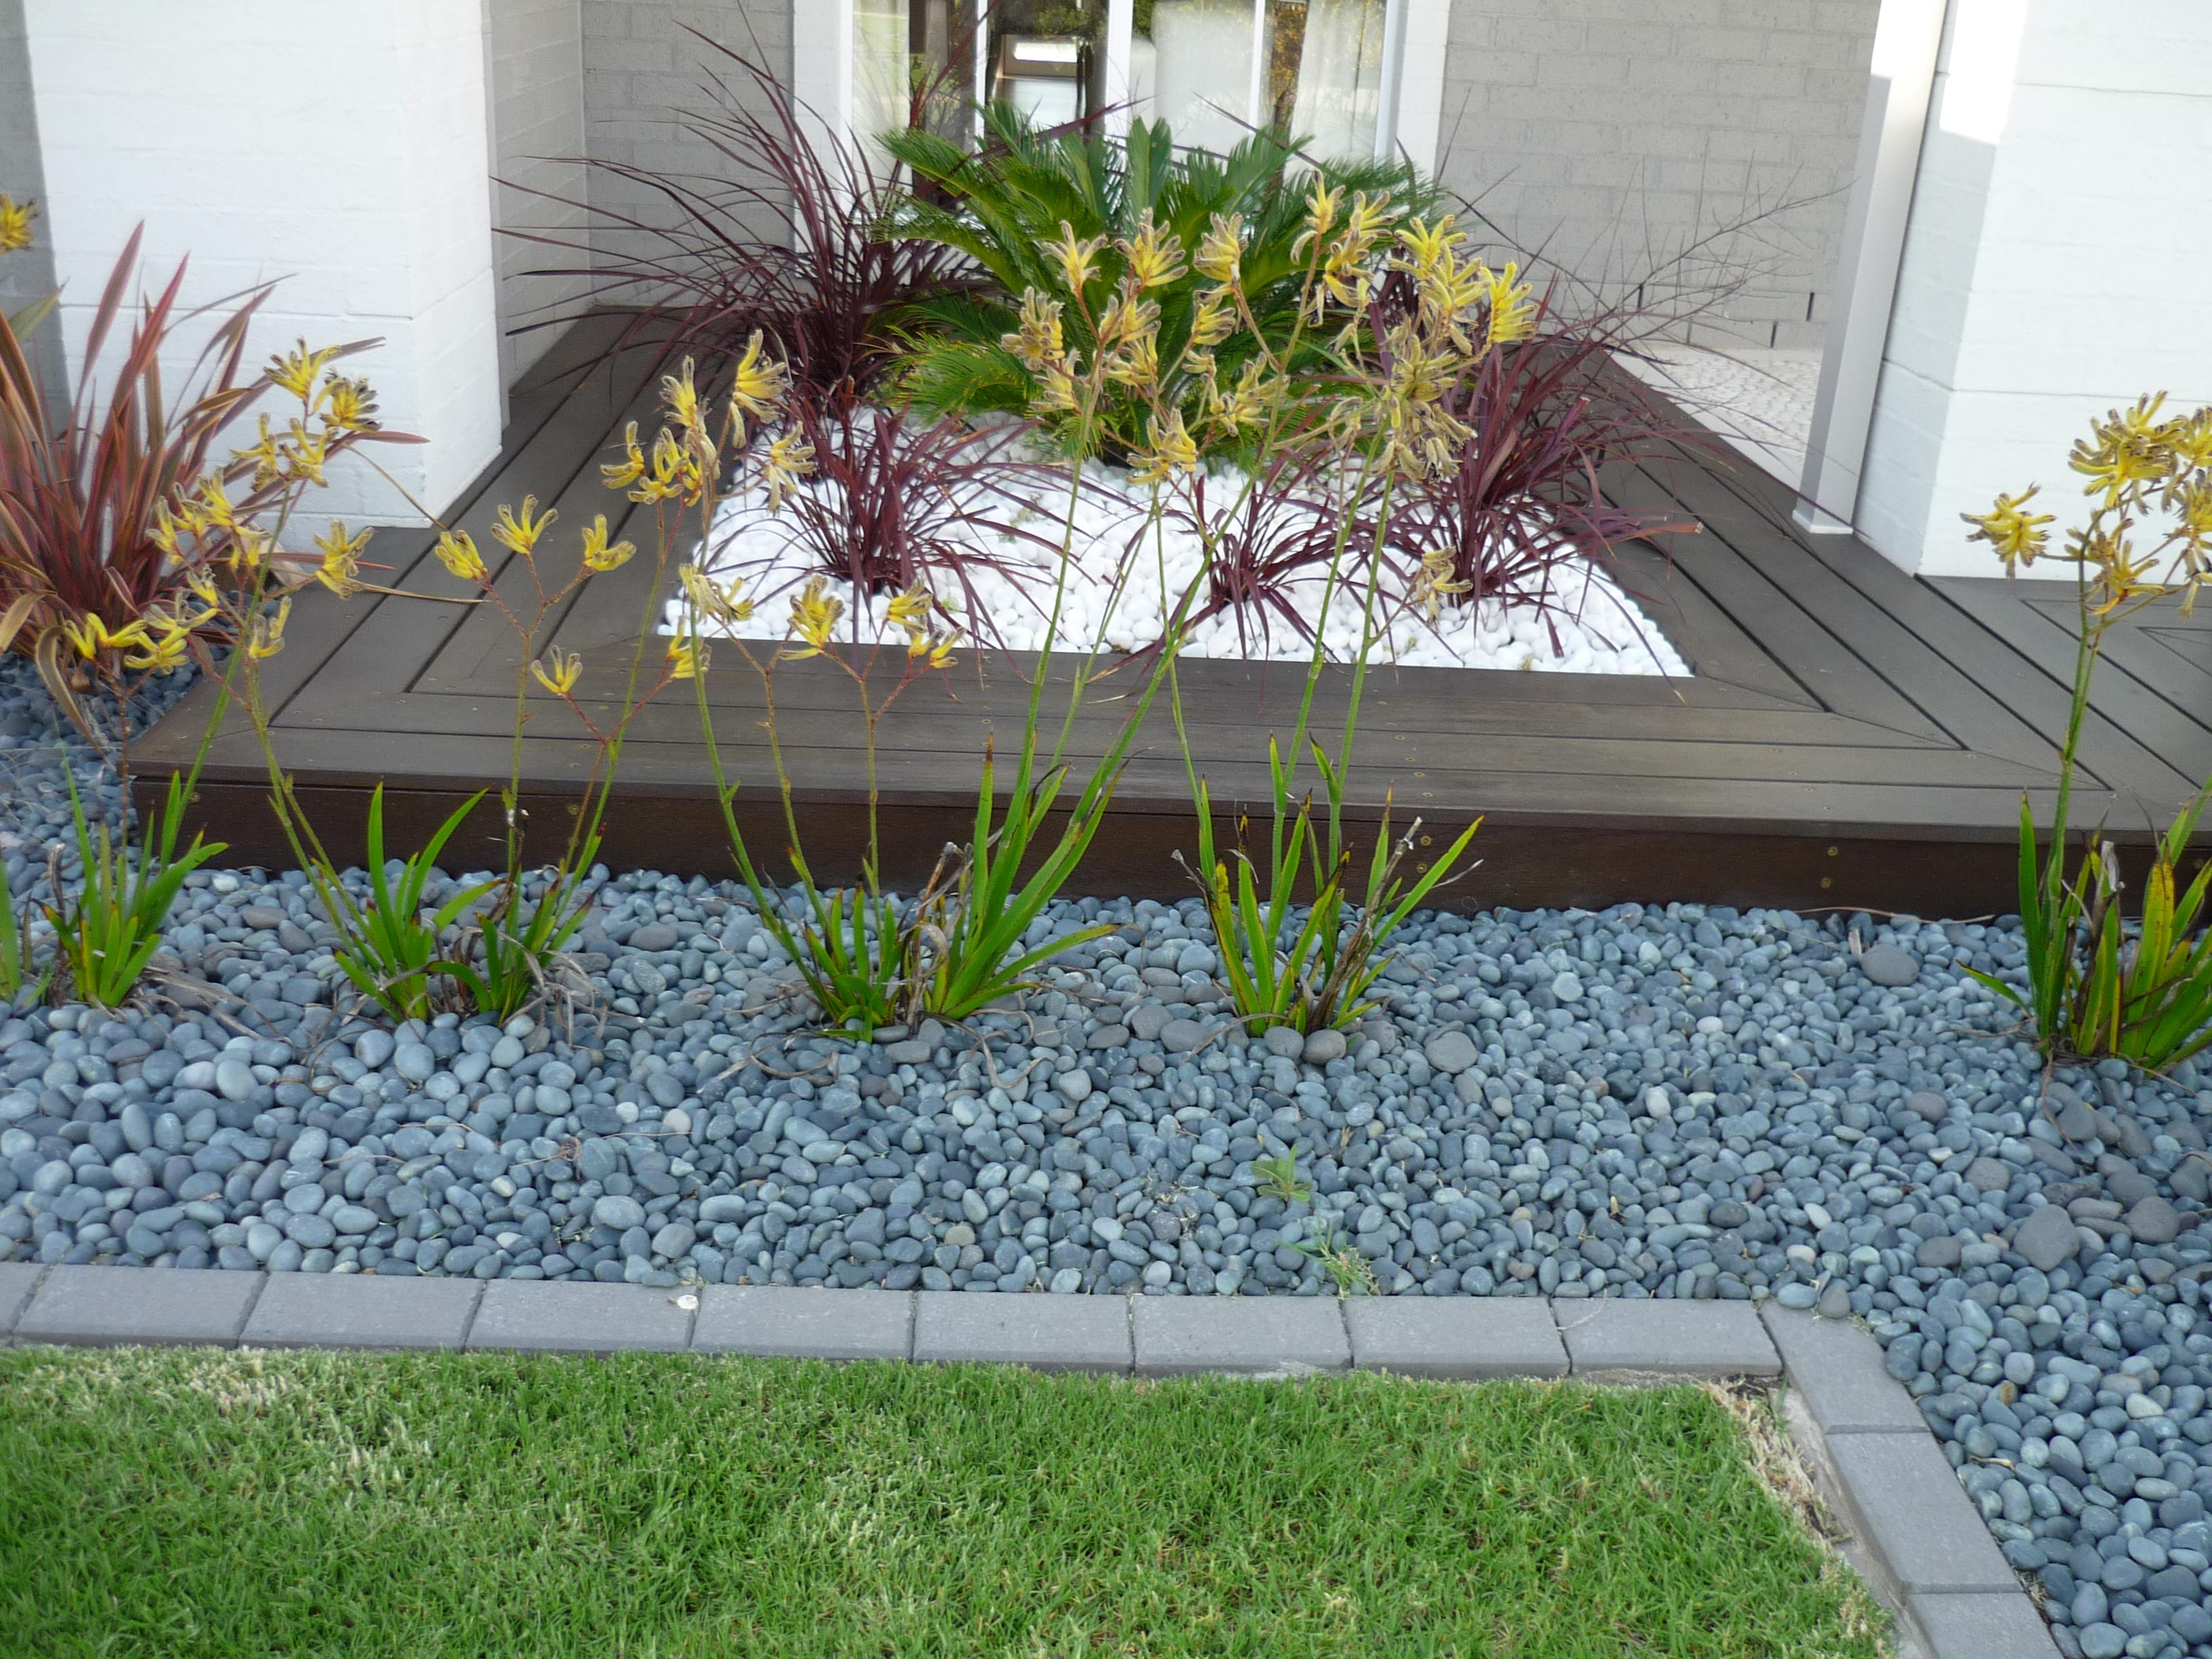 Populares 60+ Jardins com Pedras Decorativas: Fotos Lindas SP89